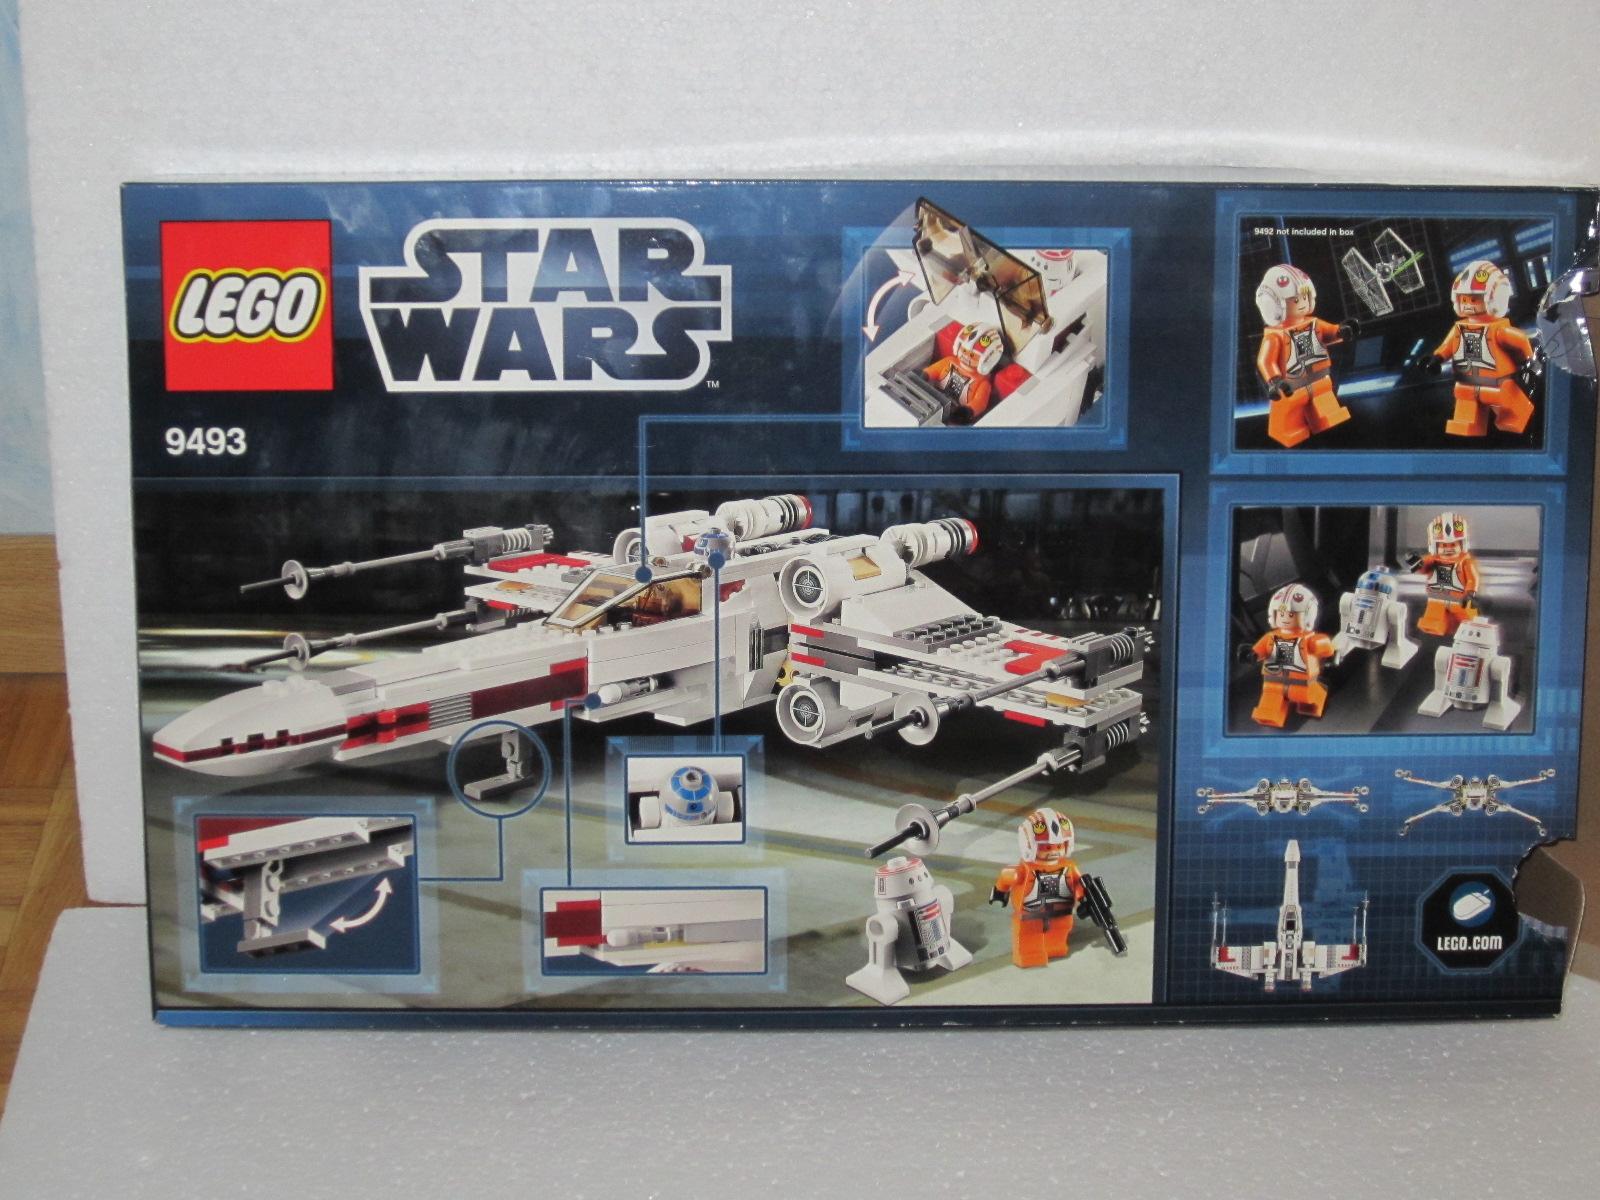 Lego star wars 9493 le x wing lego r by alkinoos - Stars wars vaisseau ...